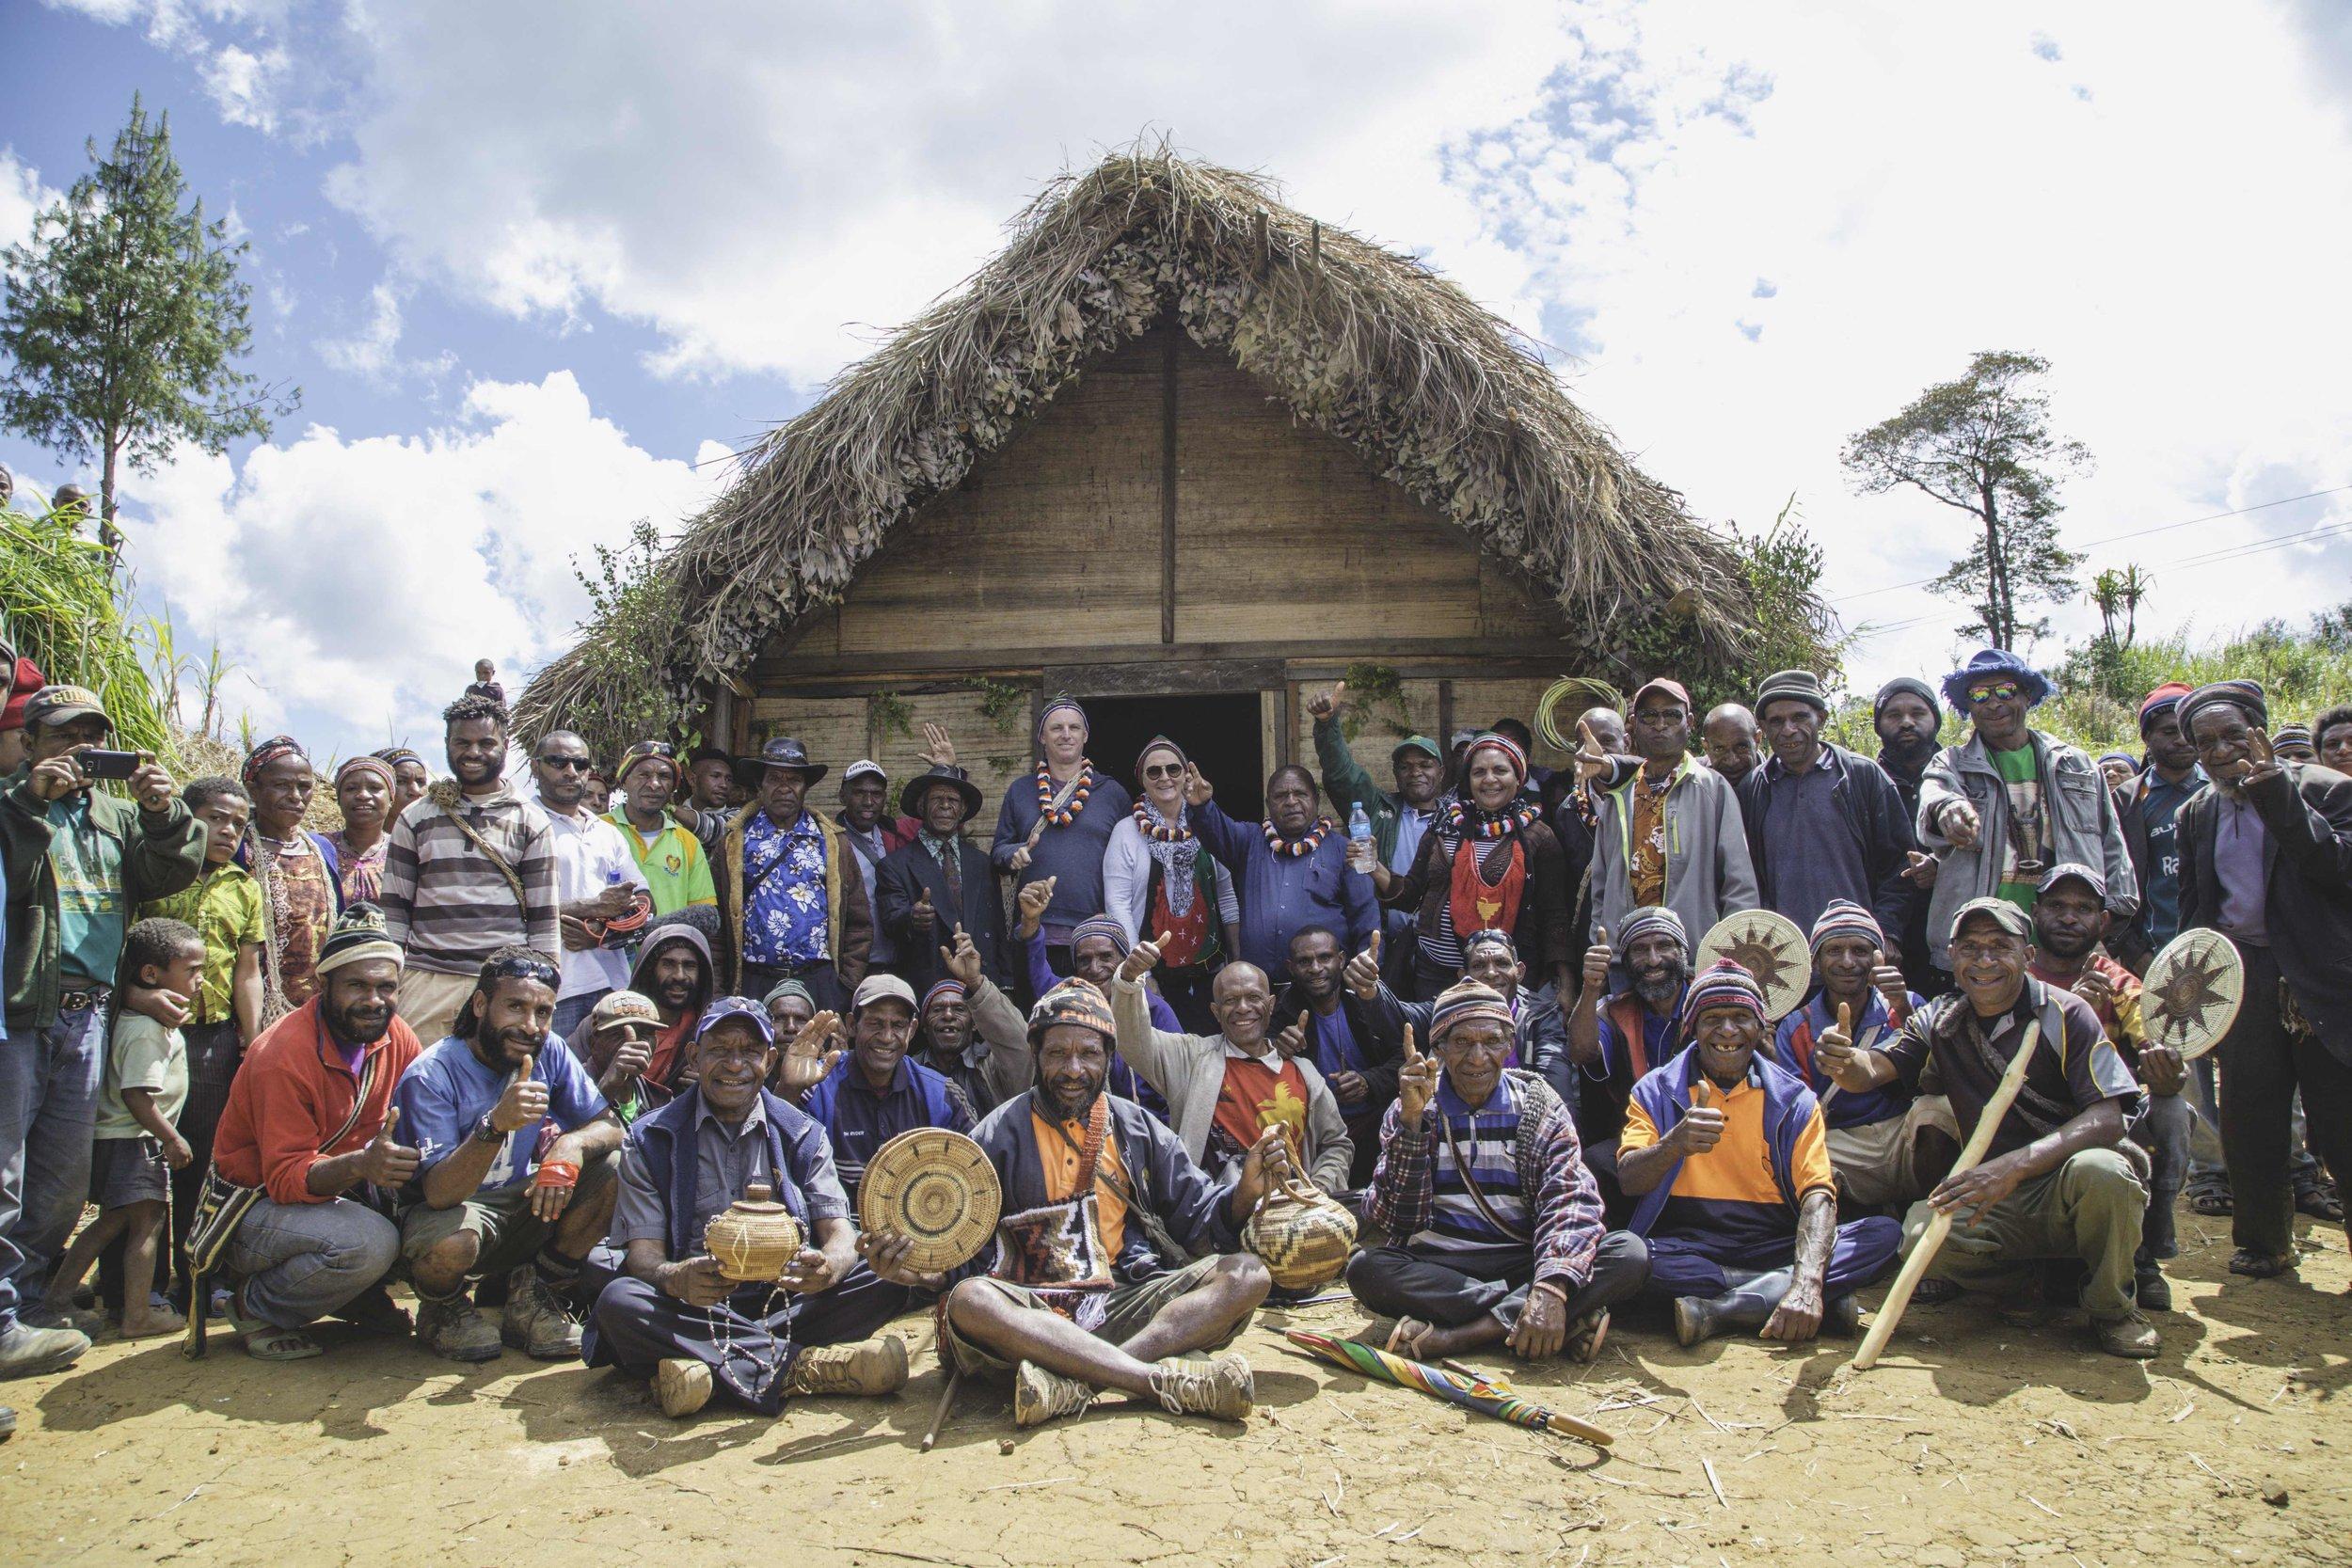 Ialibu community, Papua New Guinea. Image Credit: Alec Bruce-Mason.